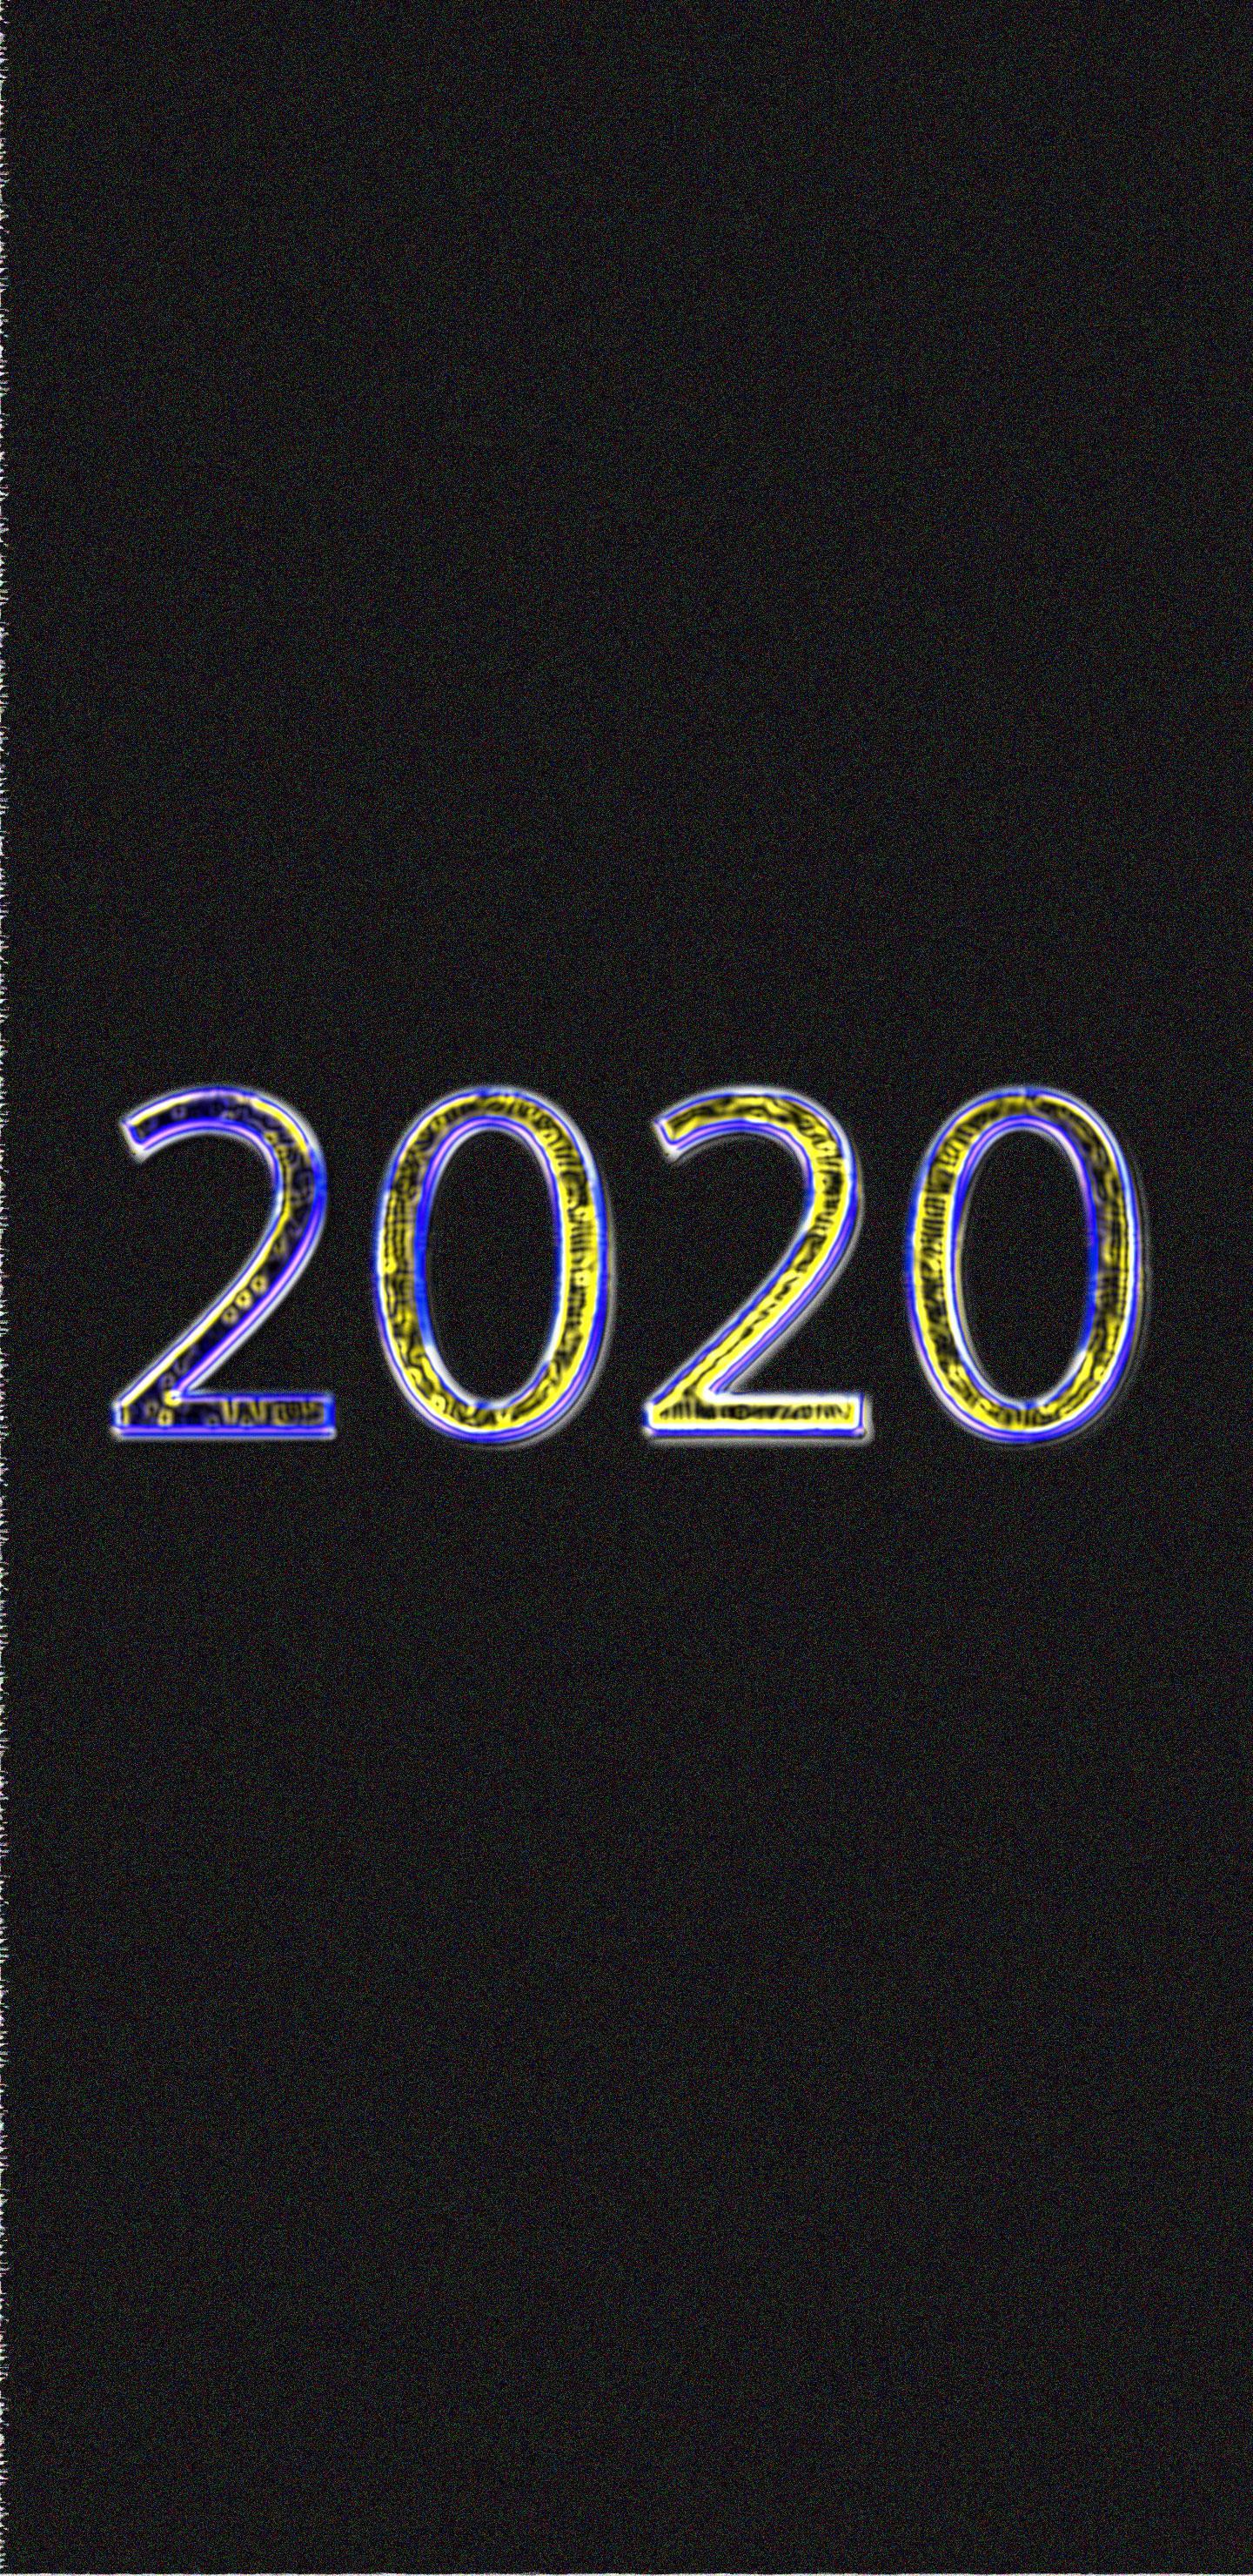 2020 Phone Wallpapers Wallpaper Cave